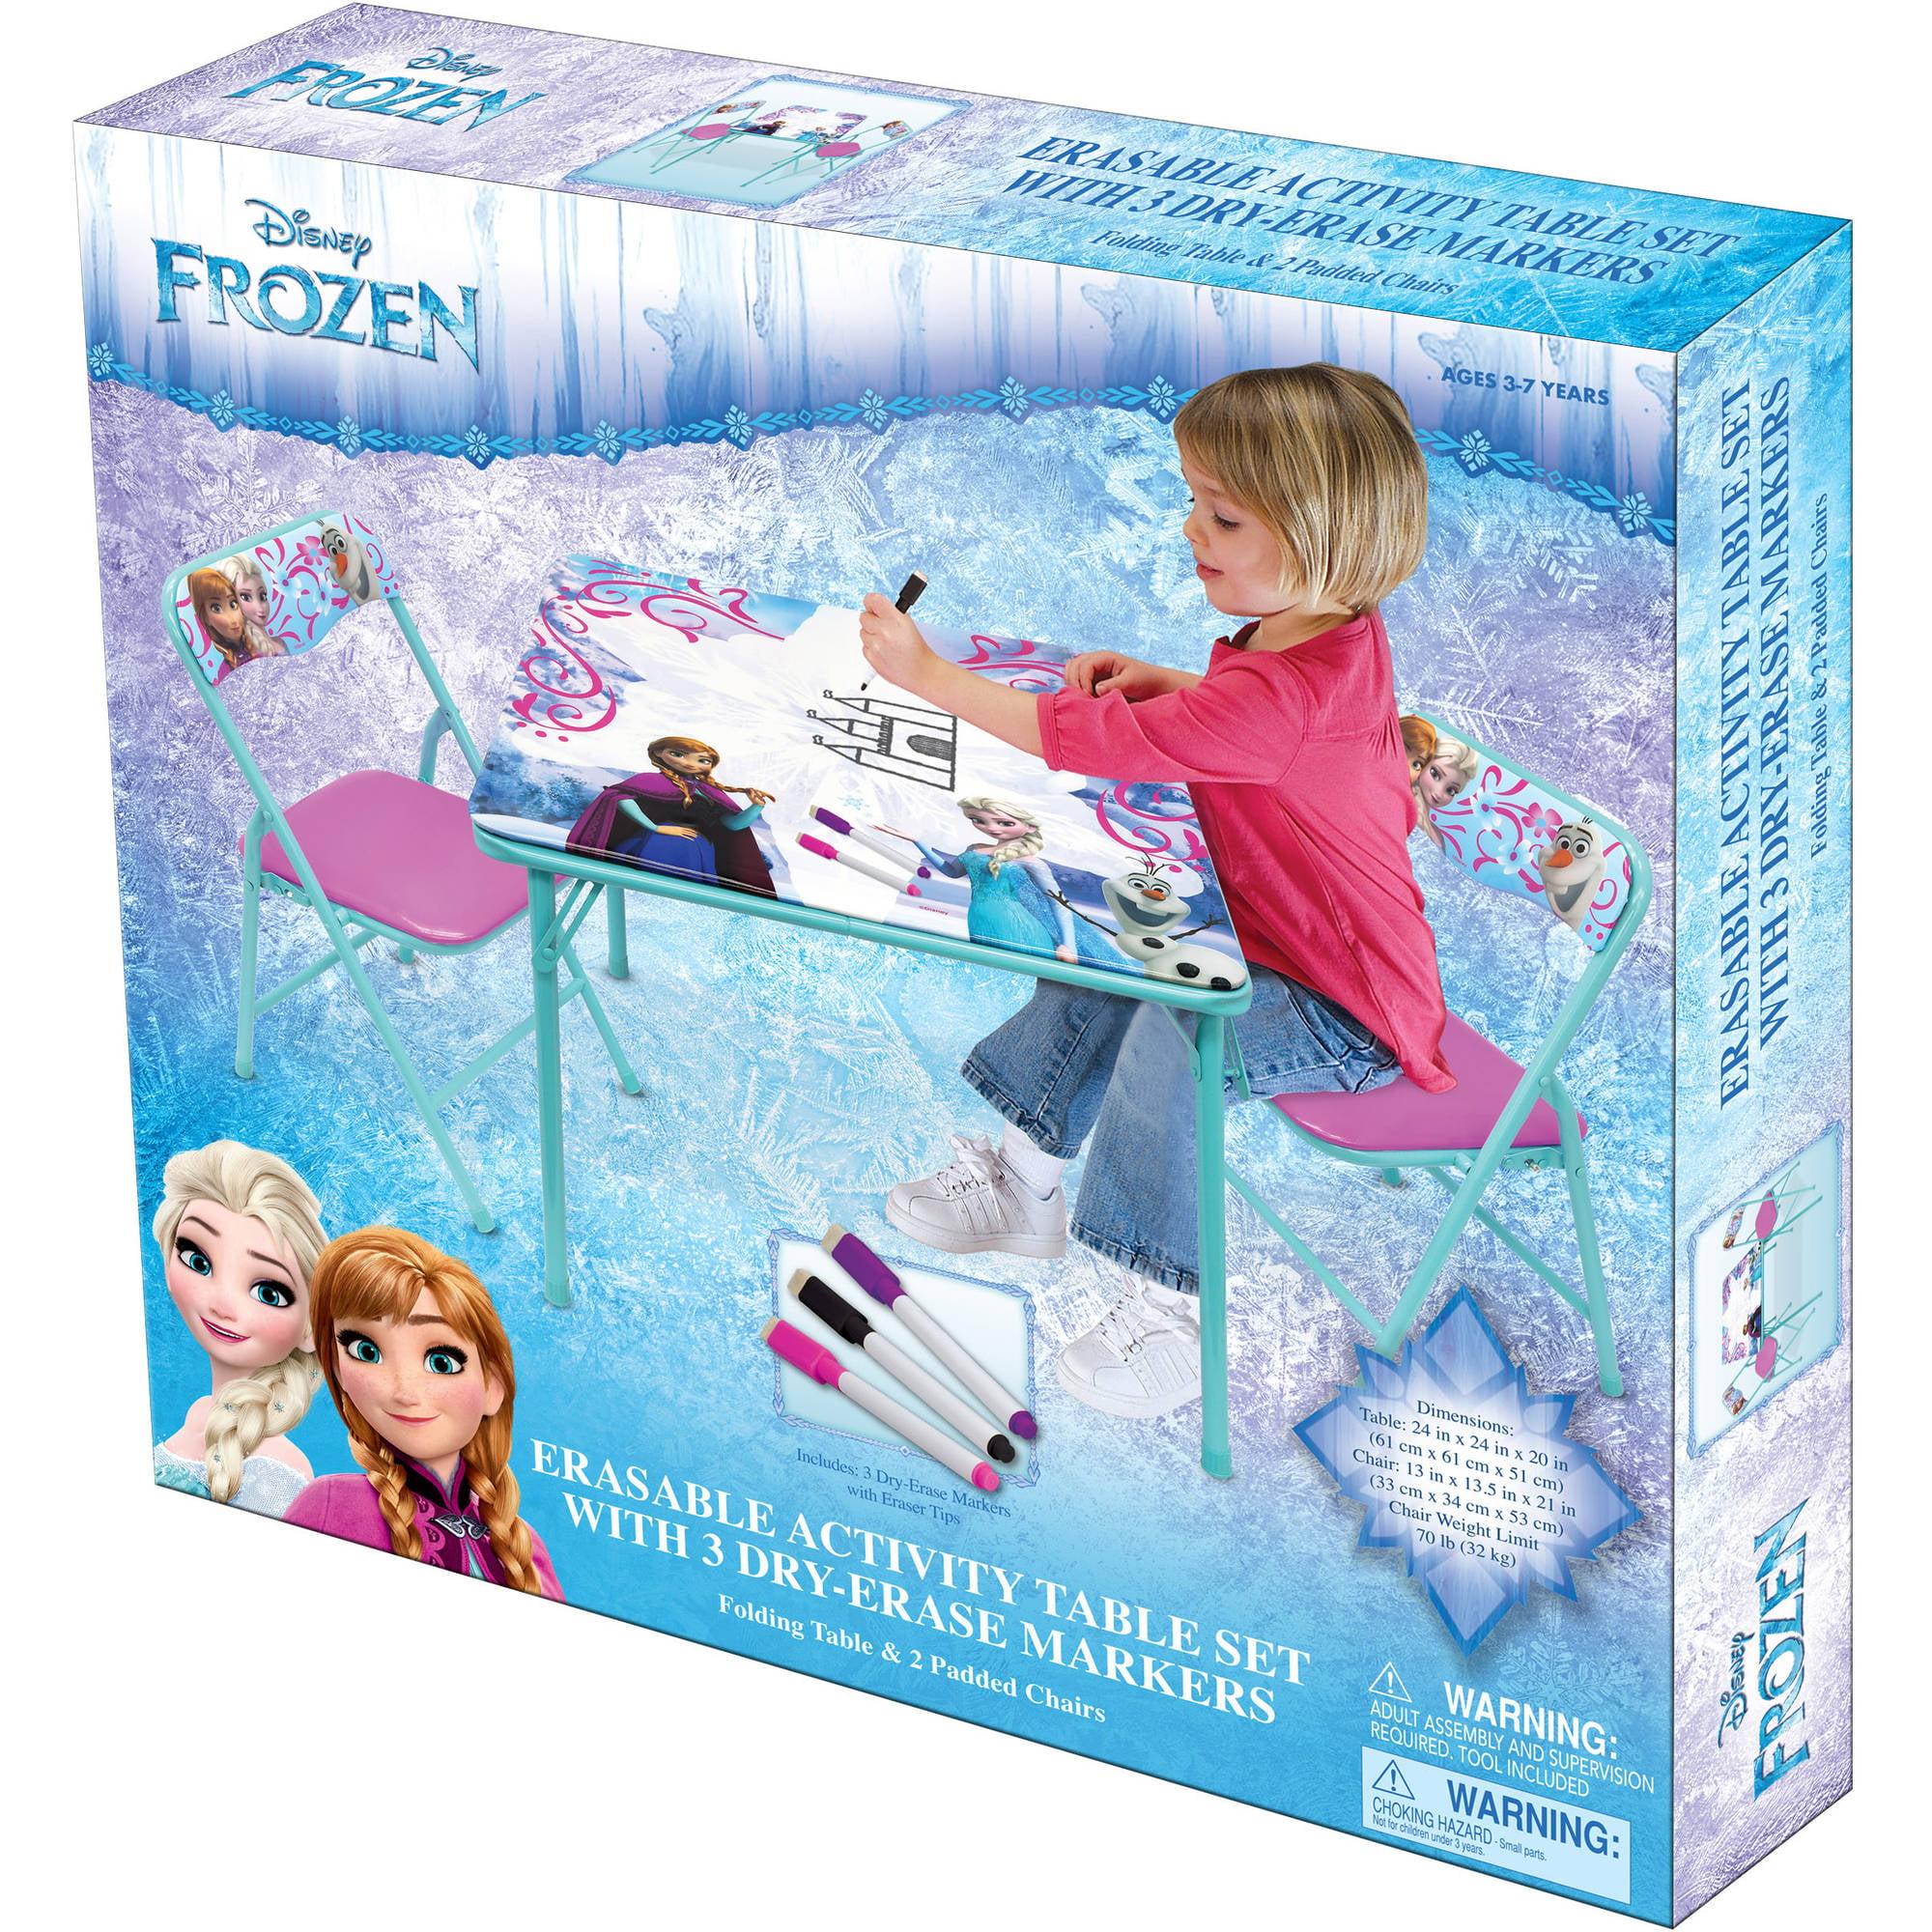 Disney Frozen Erasable Activity Table Set - Walmart.com